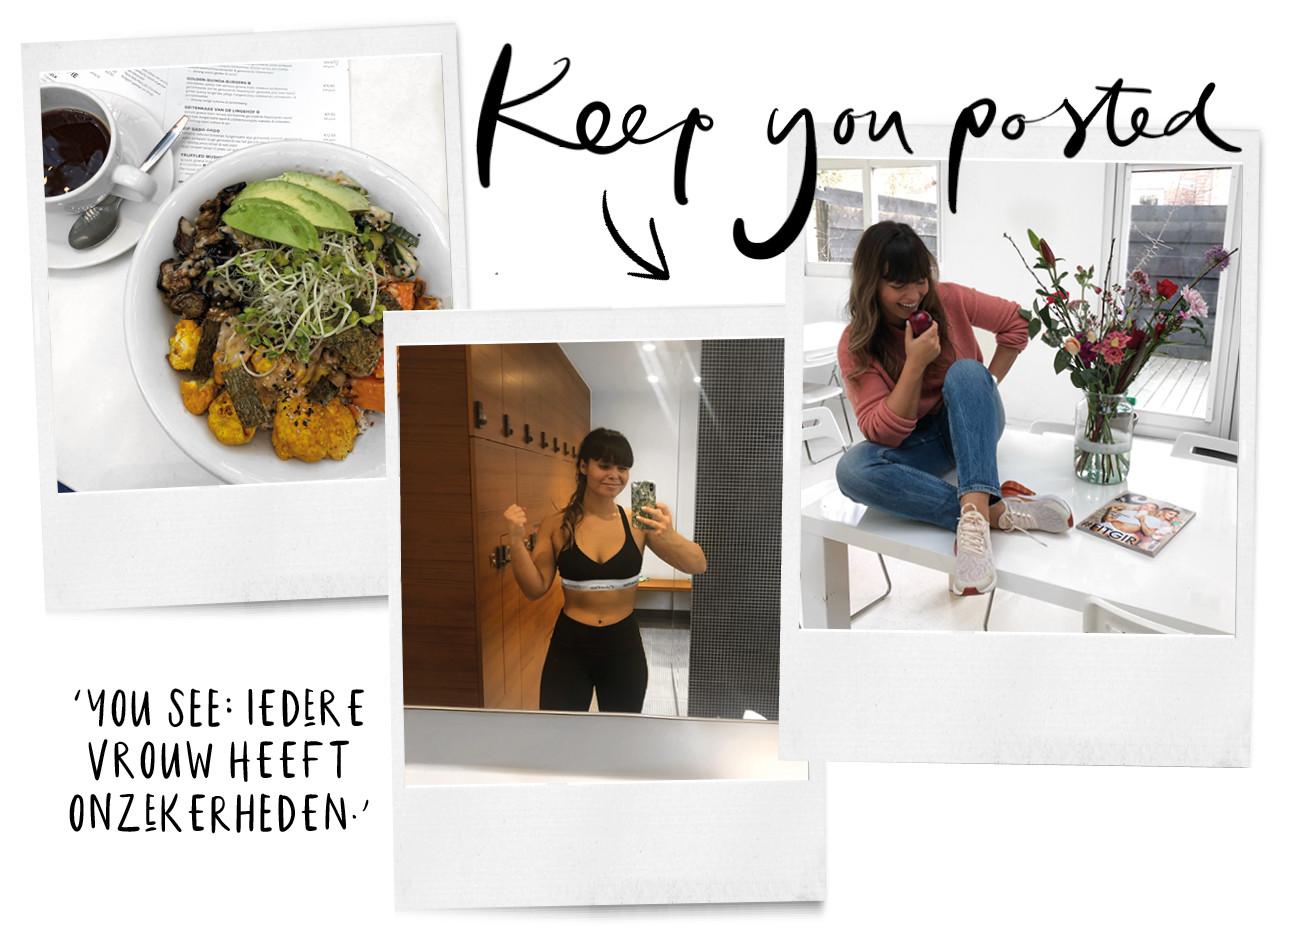 Kiki haar dieetvoedsel en Kiki in de gym